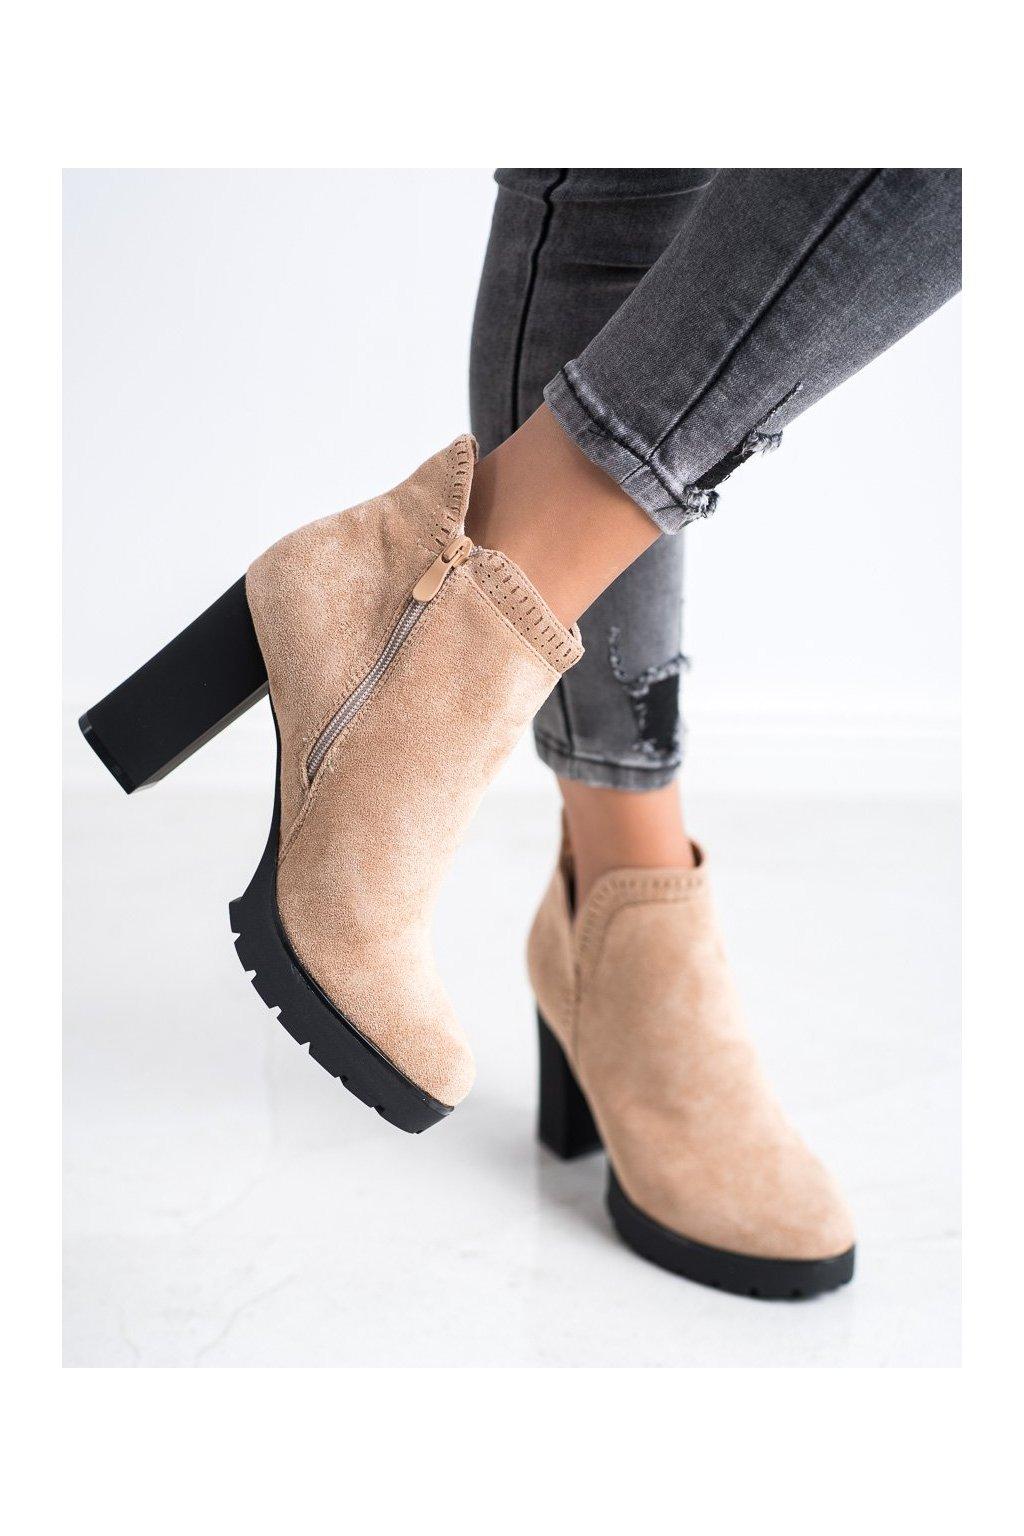 Hnedé dámske topánky Bella paris kod A5801KH